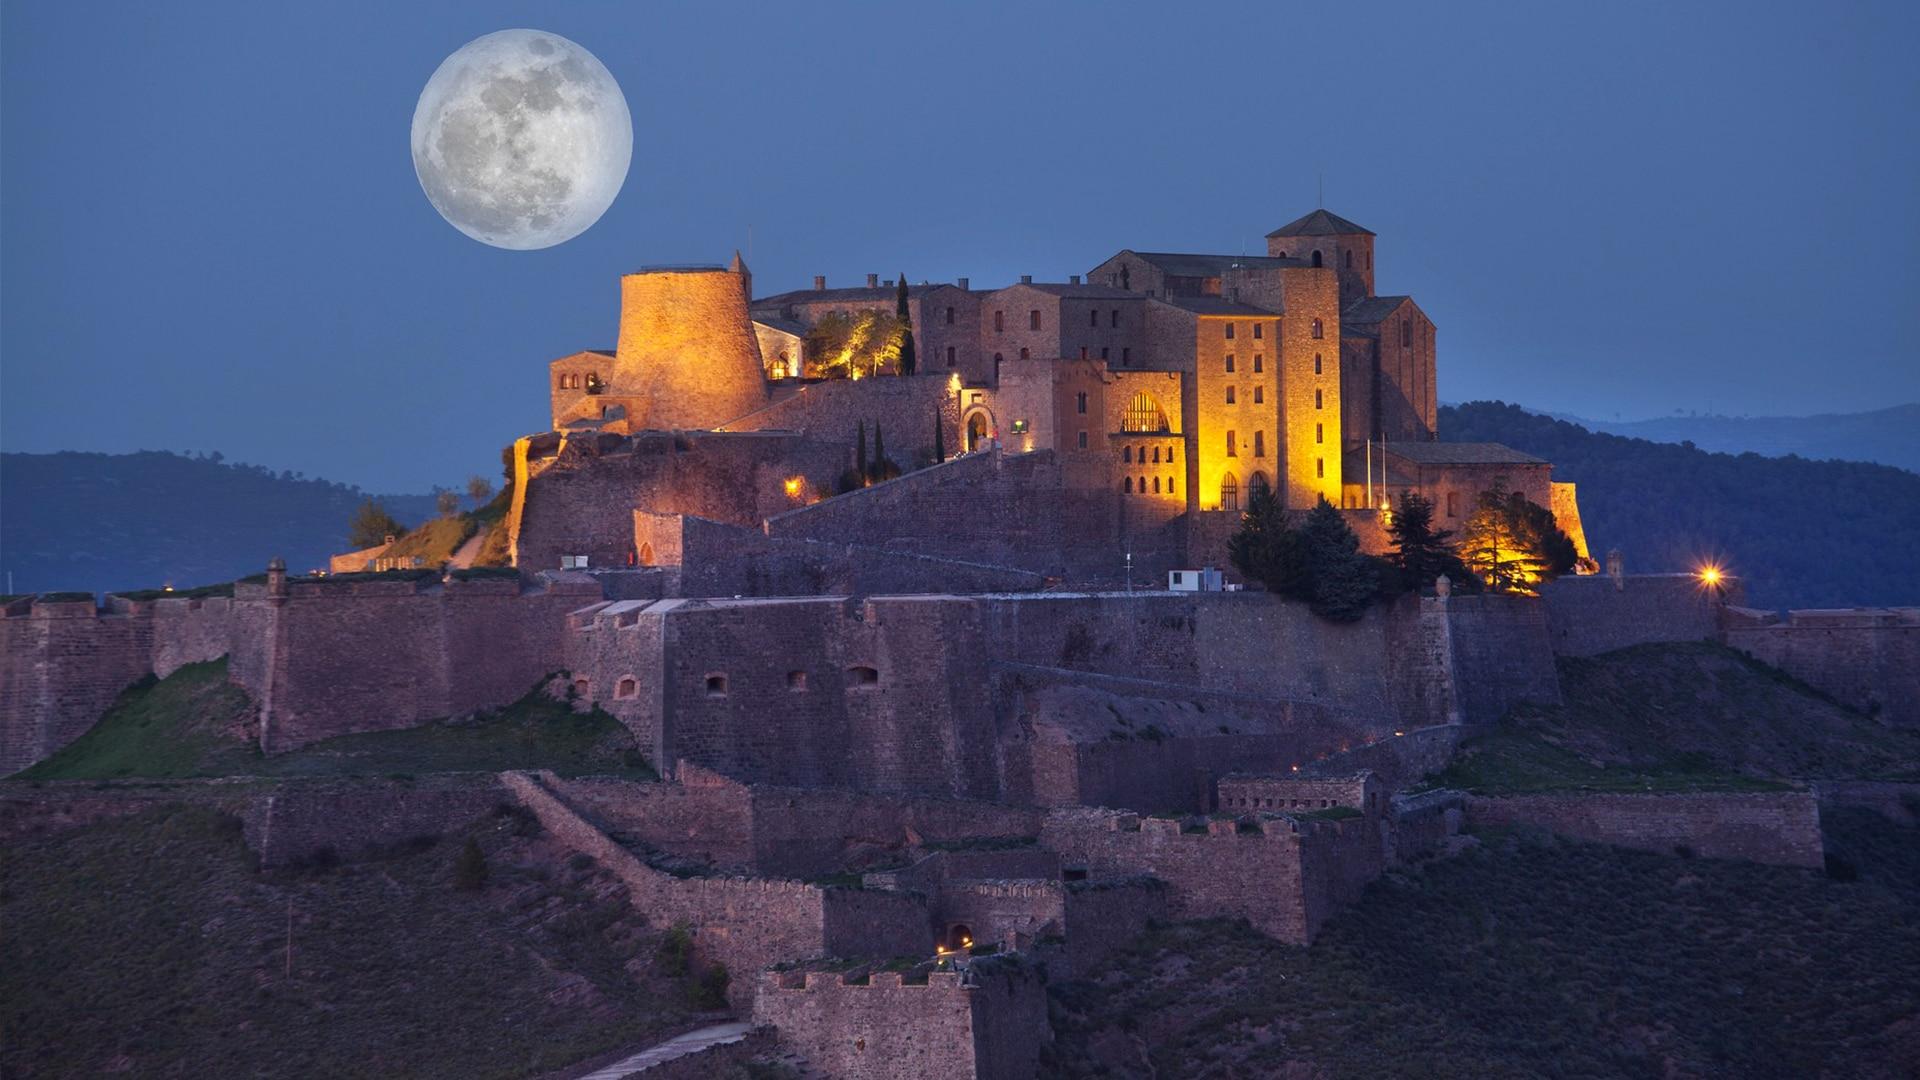 Castles_SpainInside_Cardona